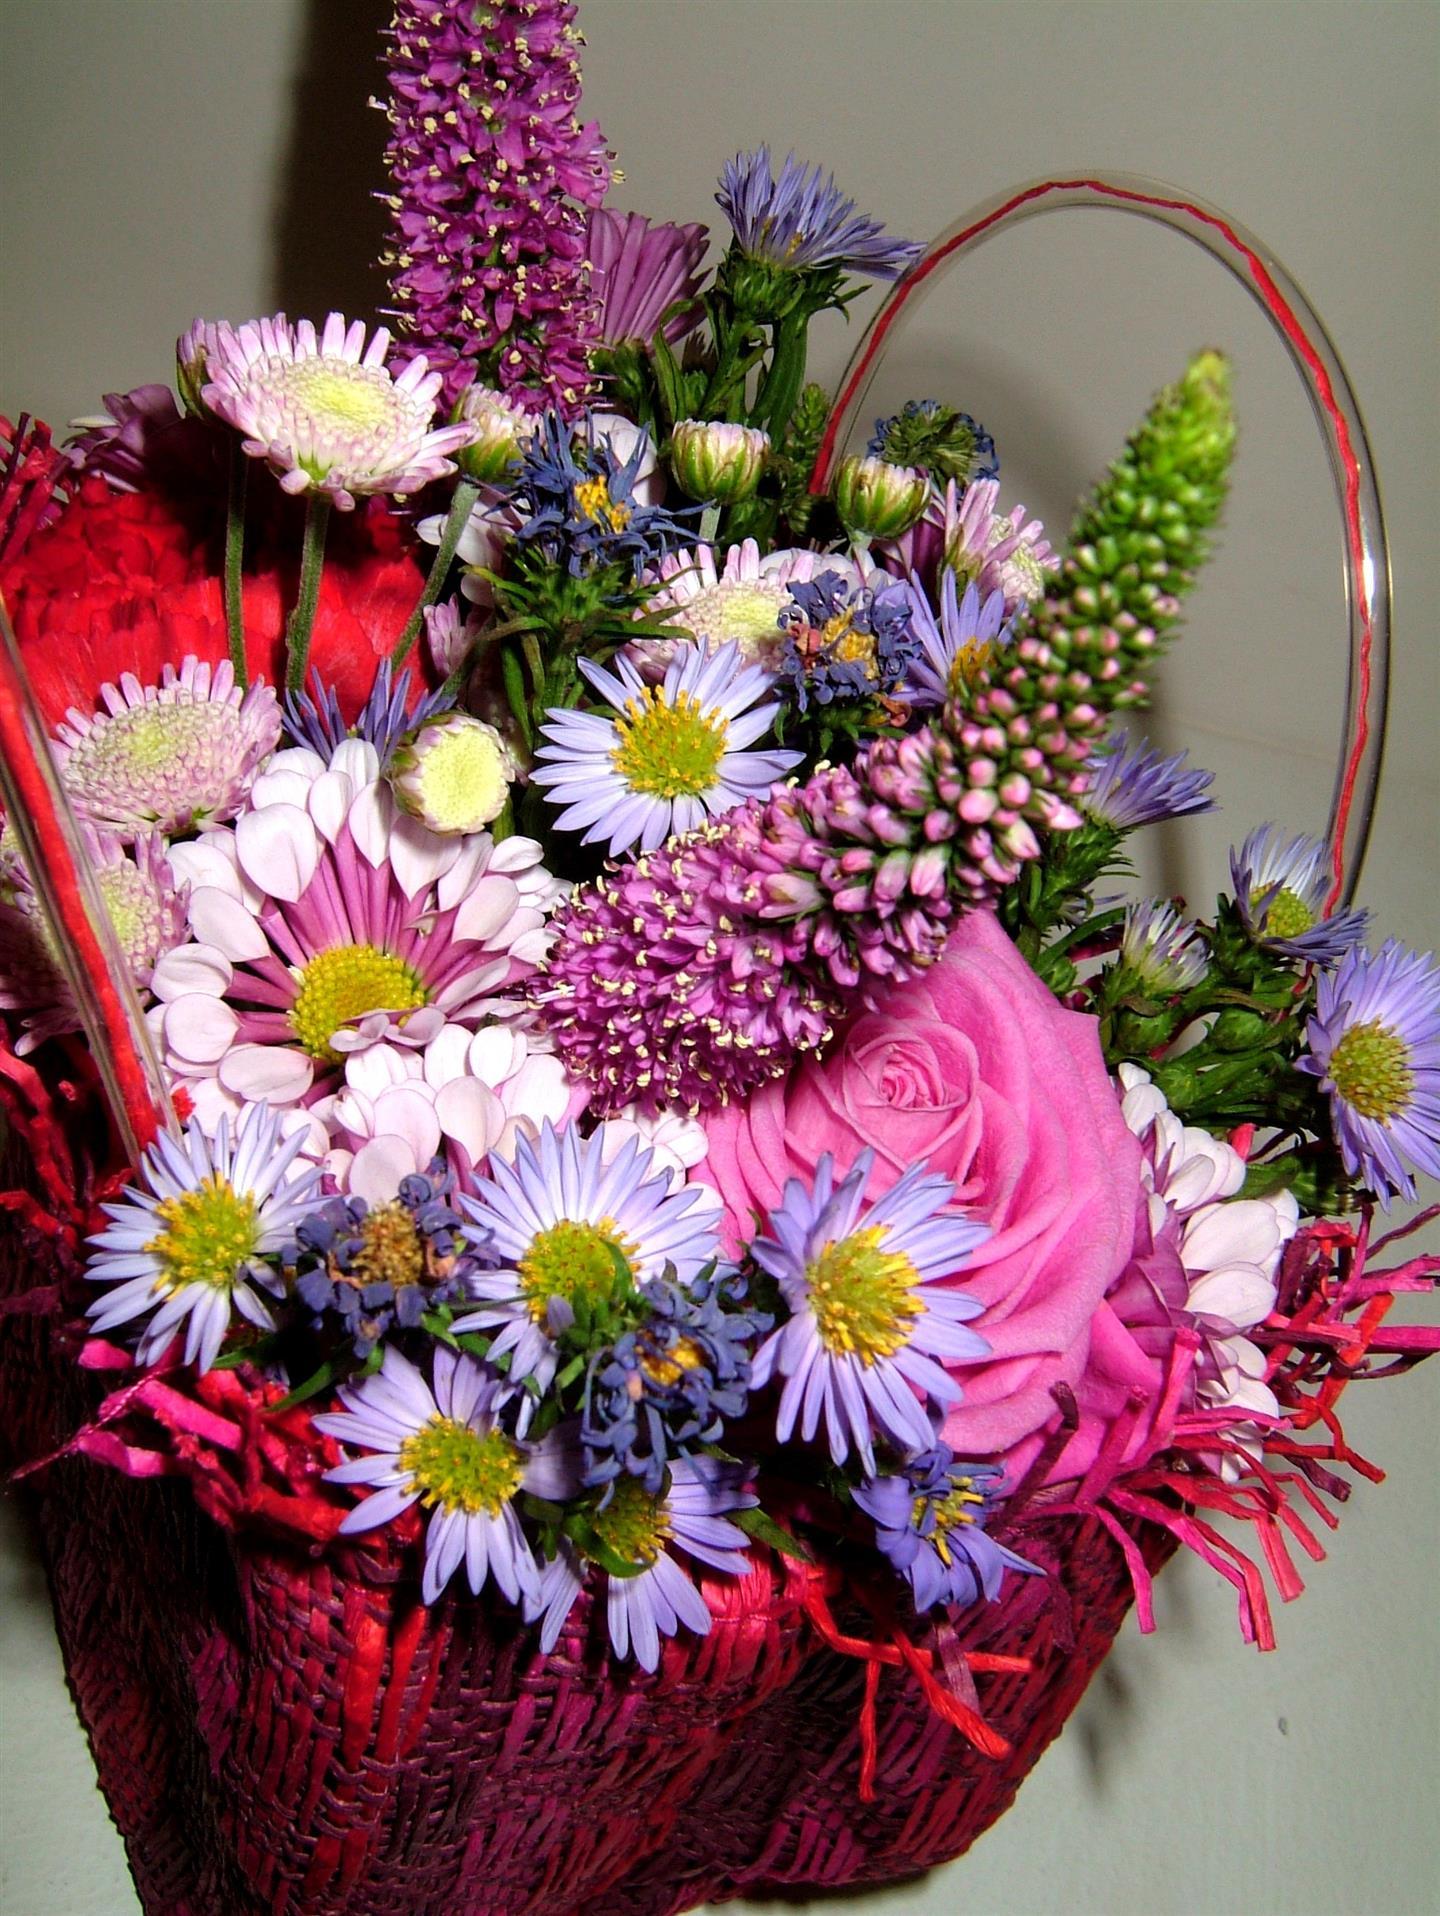 FANTASTIC FLOWERS (FRI AM)